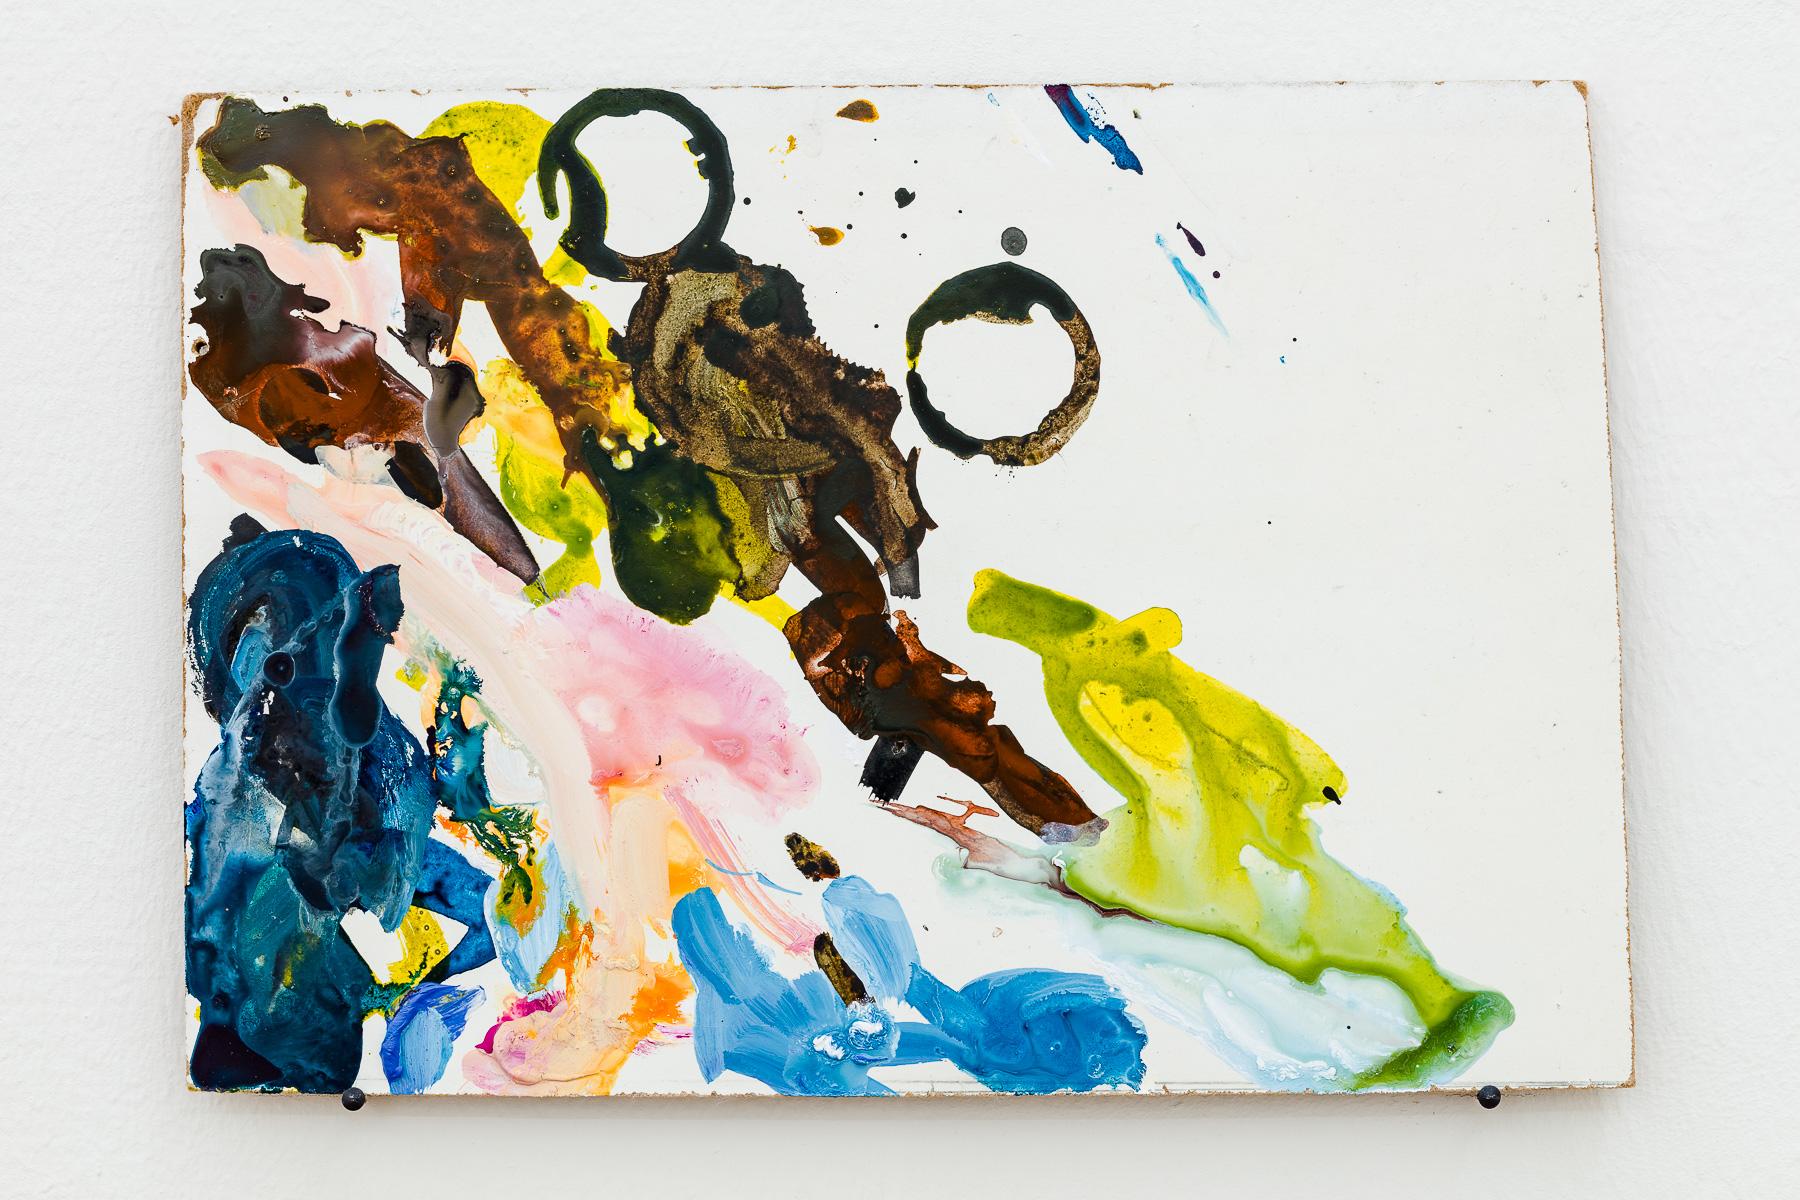 2019_05_20_Elke-Krystufek_Croy-Nielsen_by-kunst-dokumentation-com_004_web.jpg